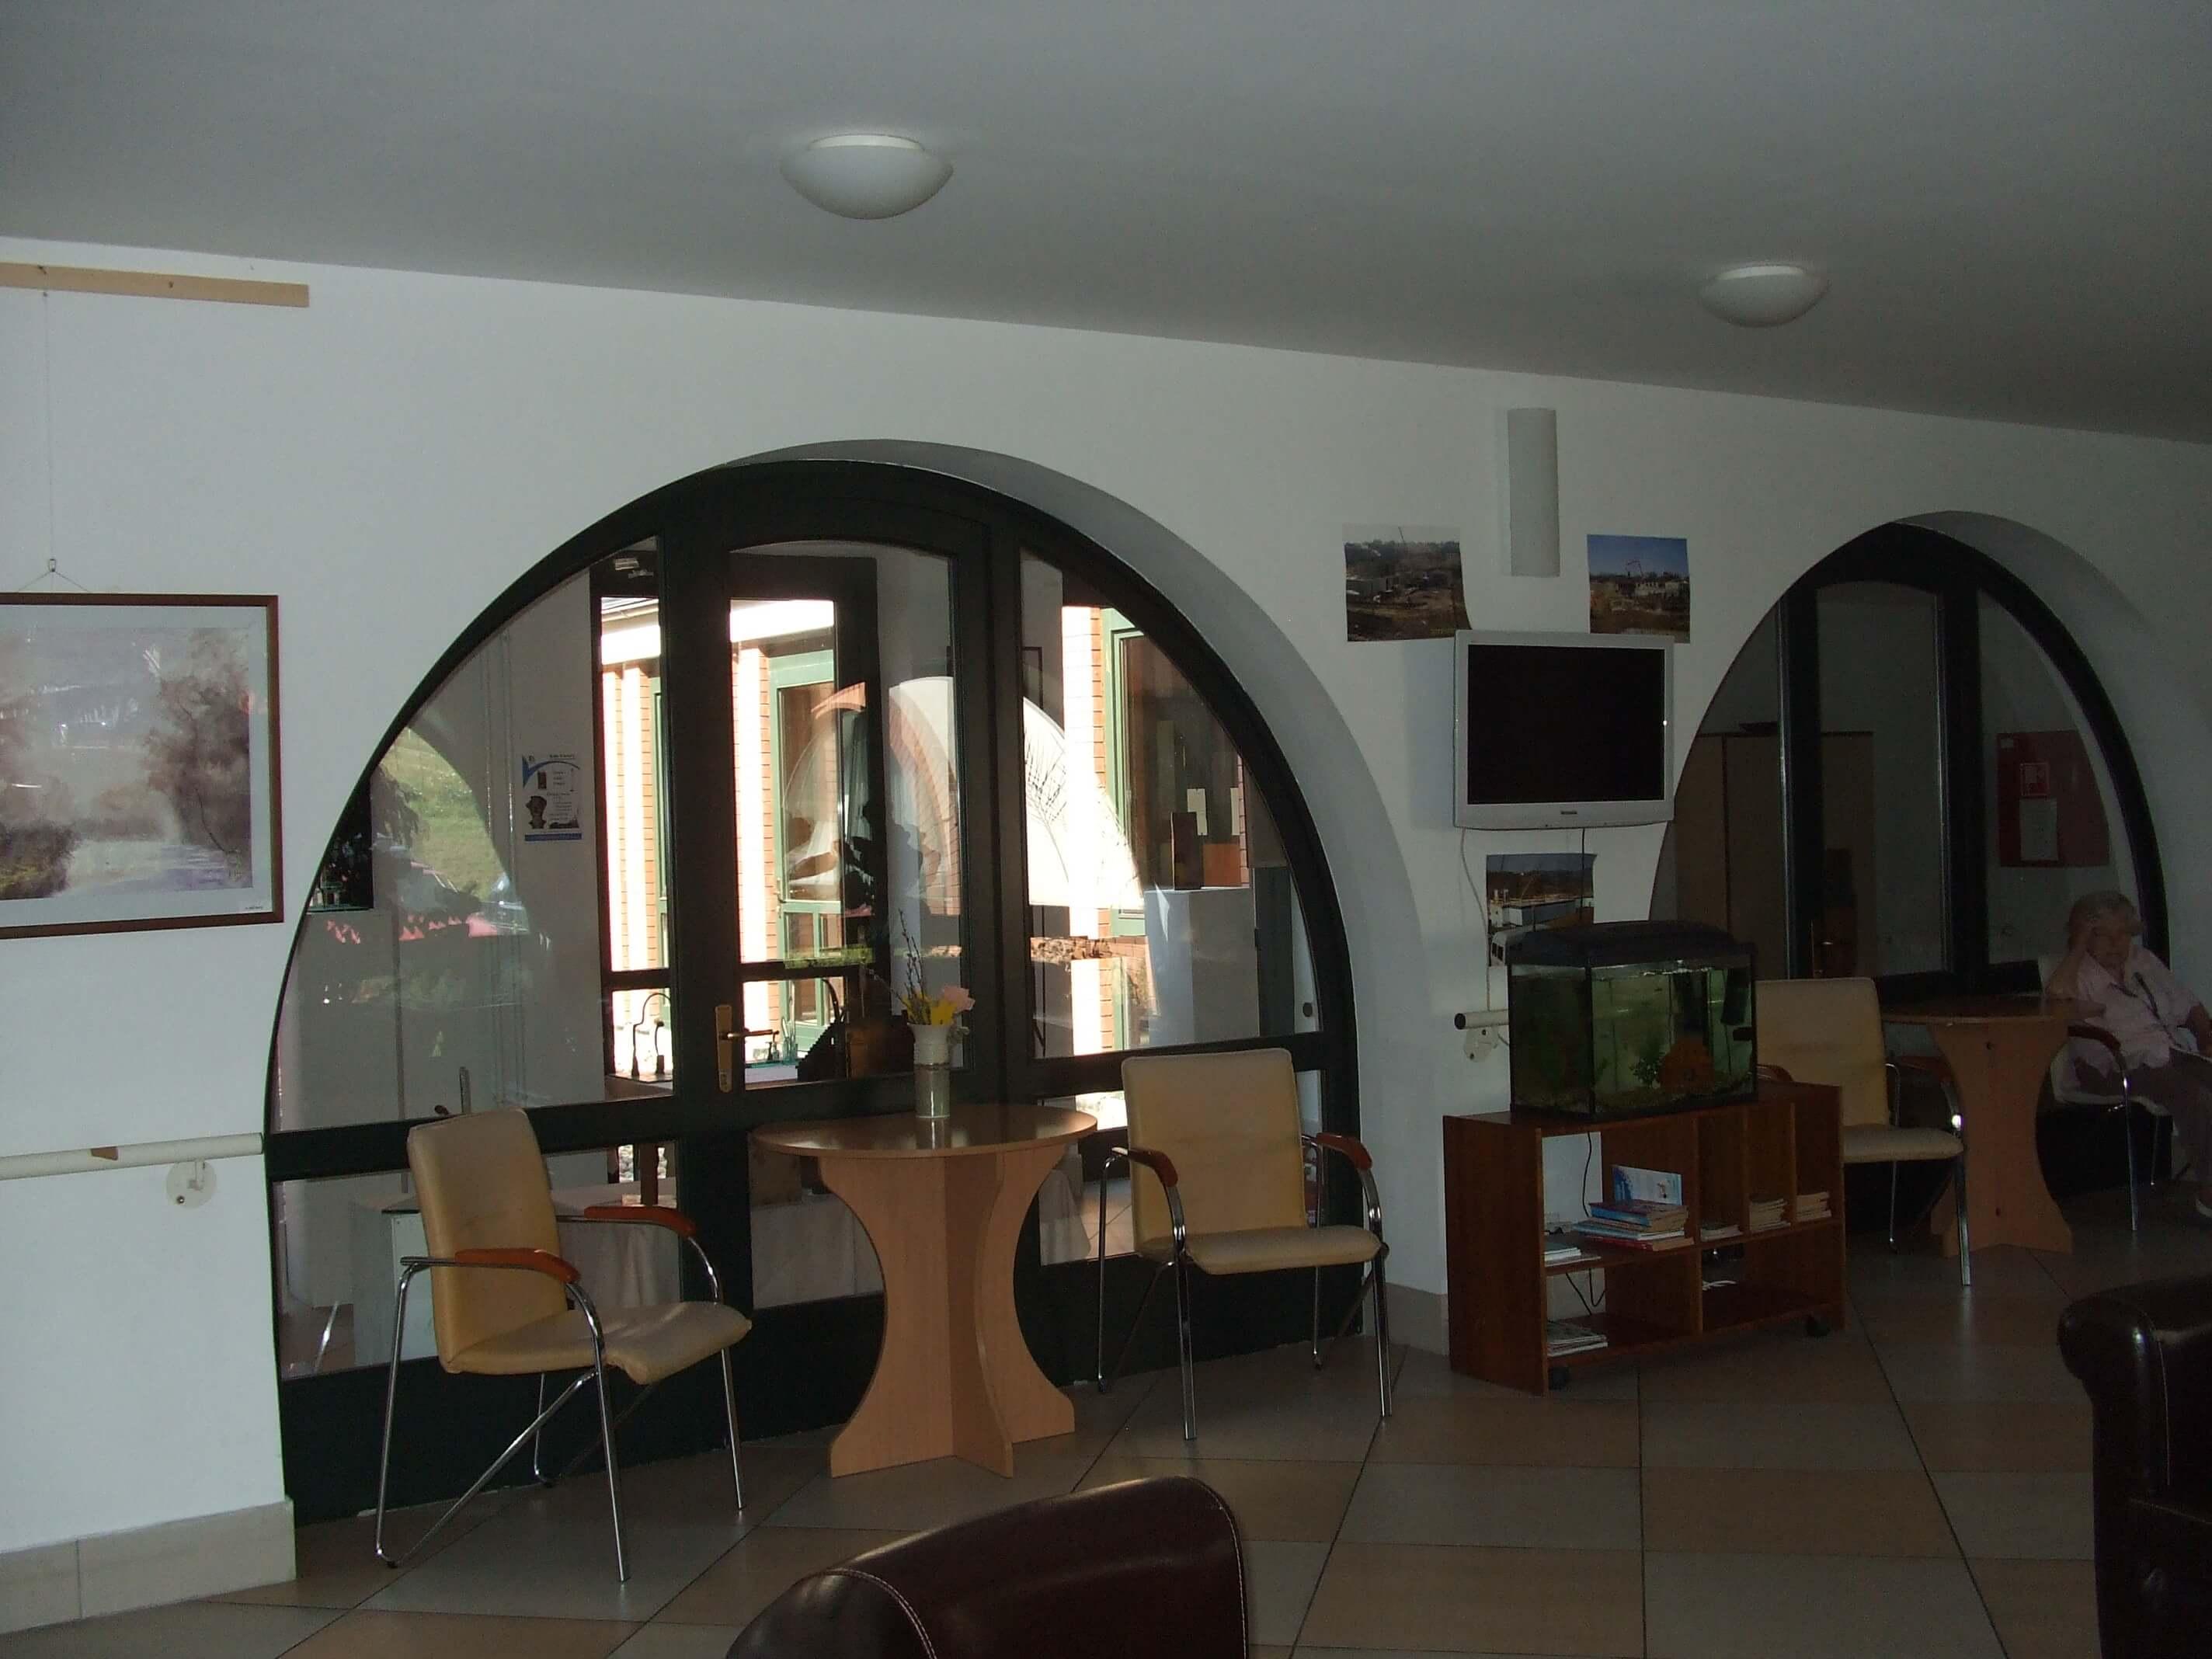 profil seniorenheim neben budapest. Black Bedroom Furniture Sets. Home Design Ideas